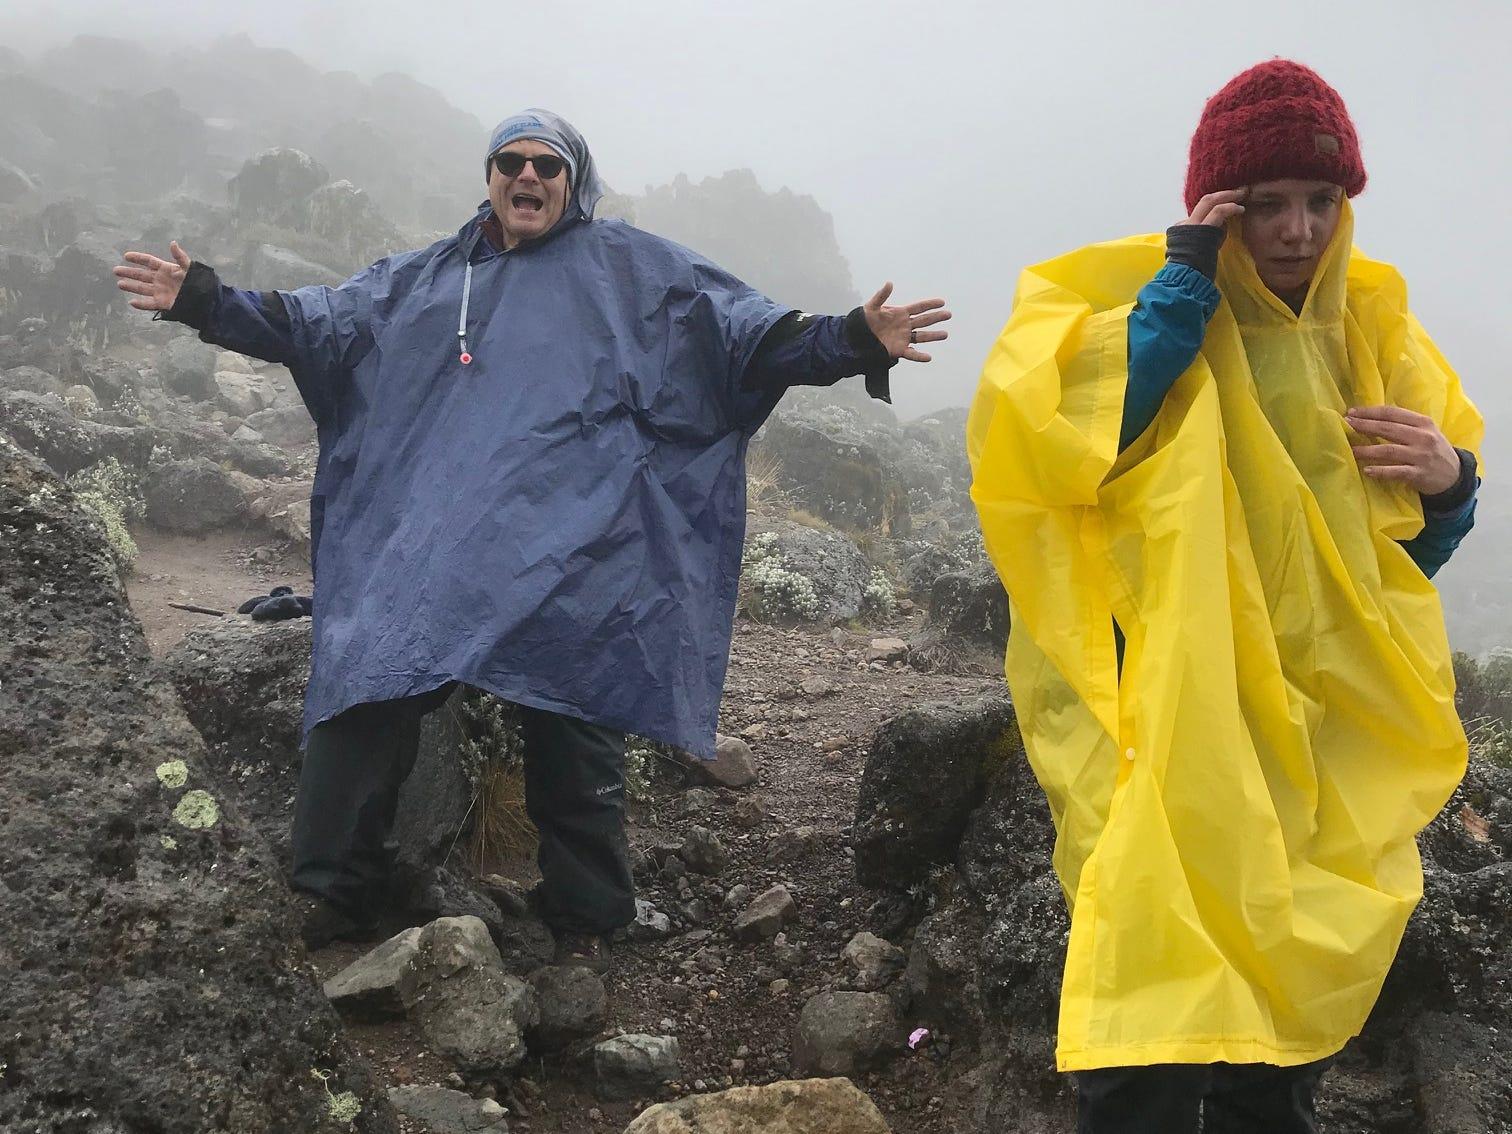 John Grantz and Jordan Grantz trekking Mount Kilimanjaro, Tanzania